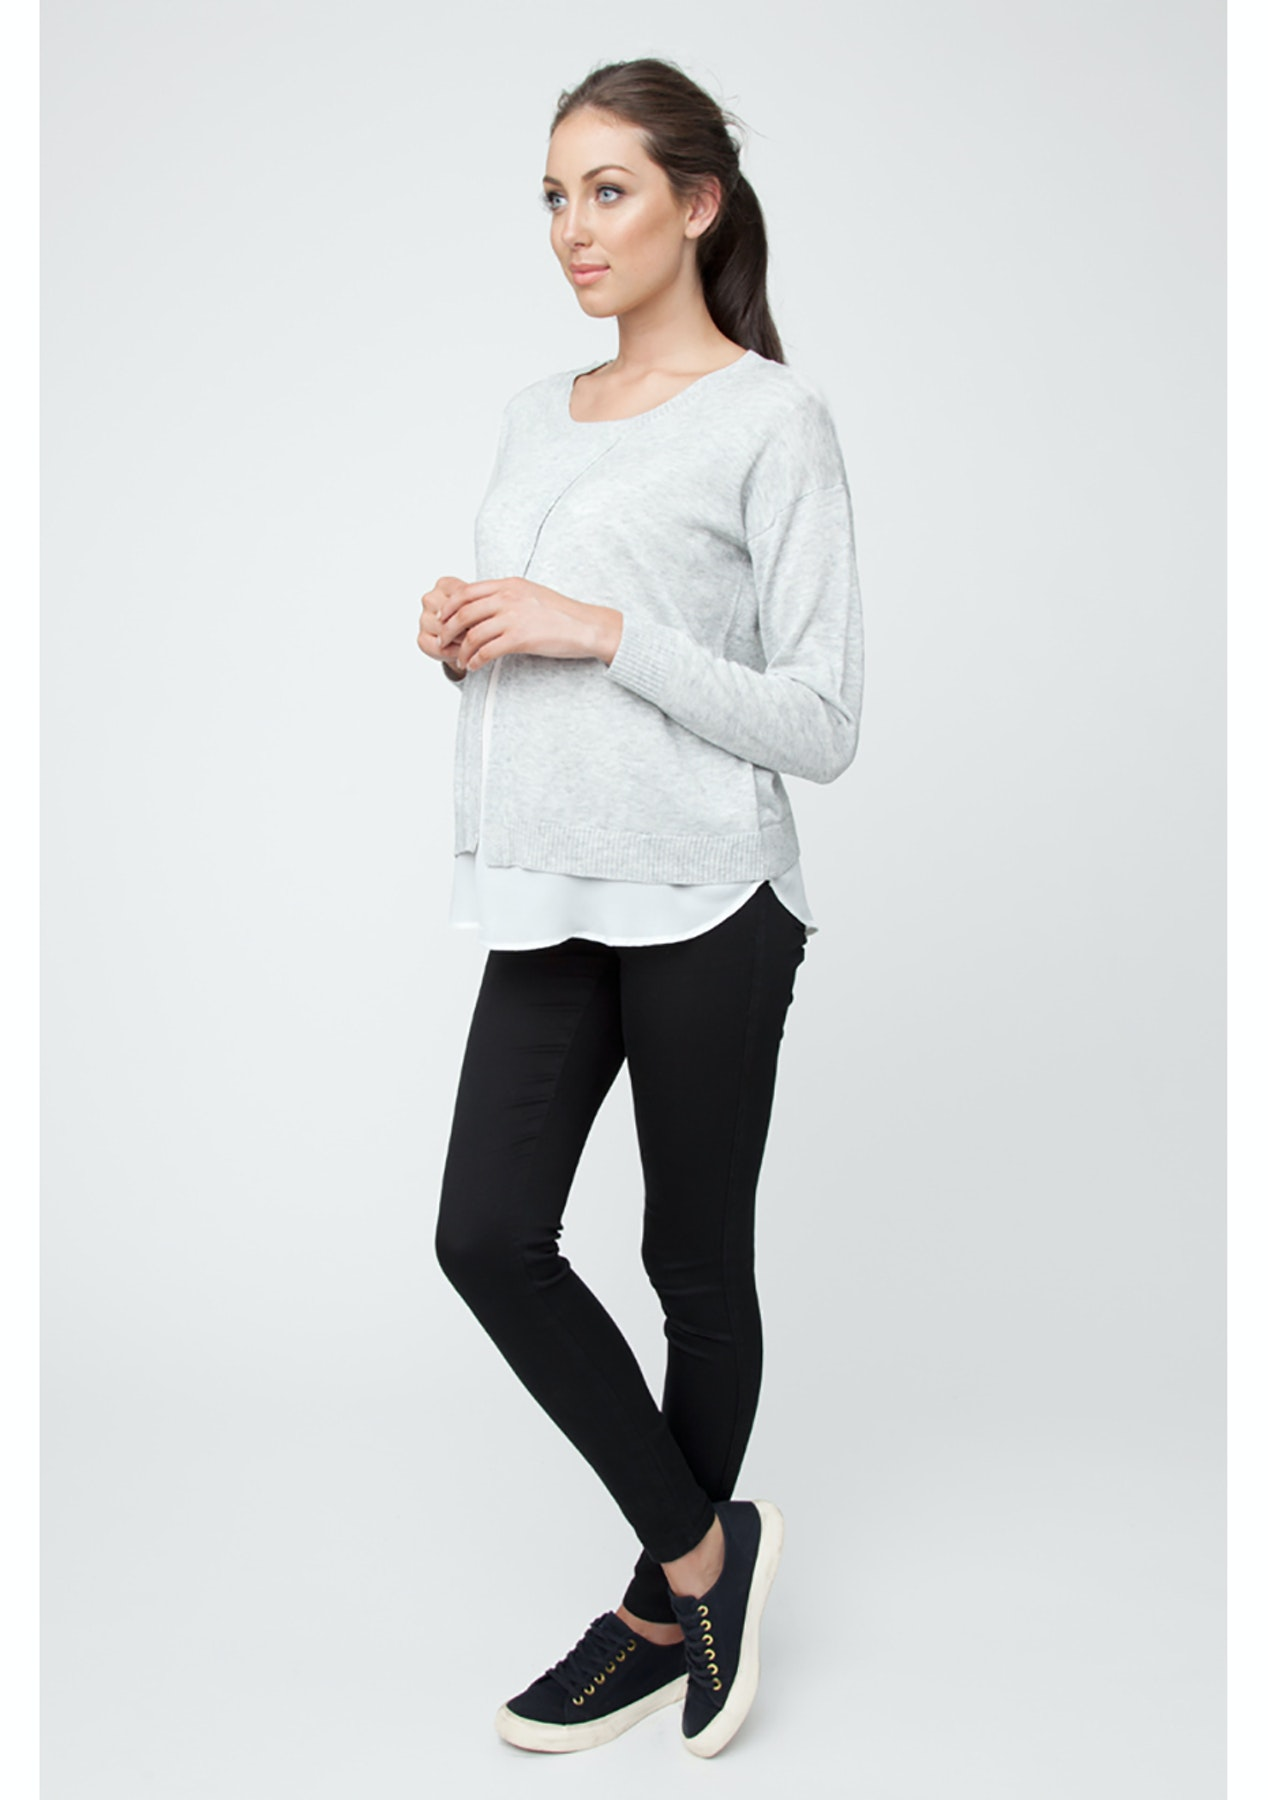 15bee14da22ec Ripe Maternity - Cross Front Nursing Sweater - AshMilk - Ripe Maternity -  Onceit